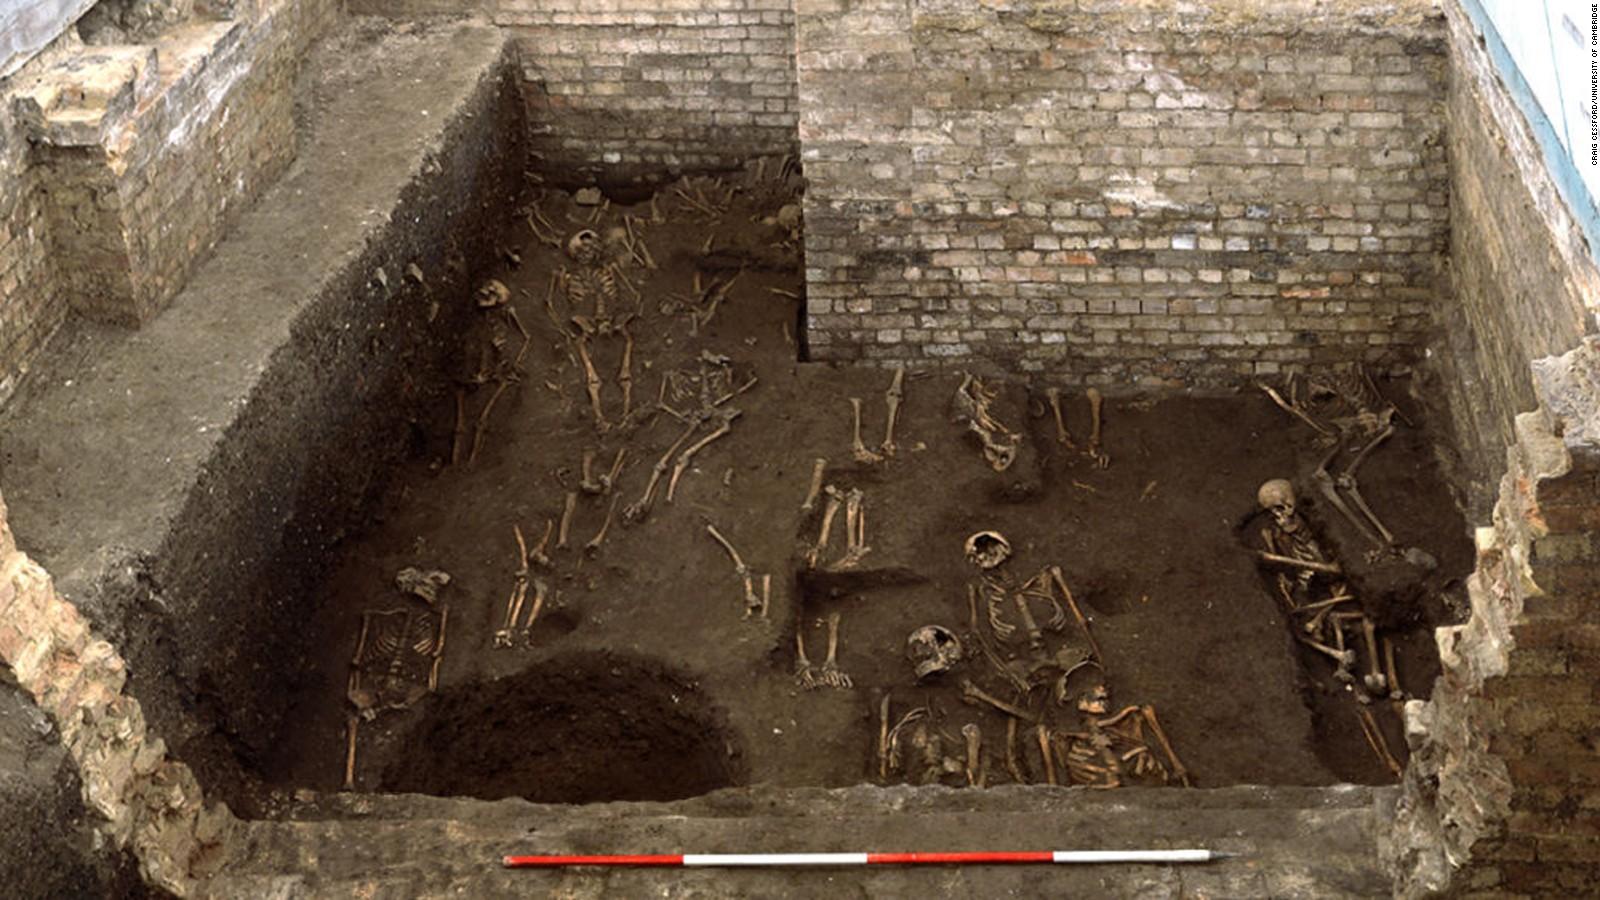 photos show medieval graves at university of cambridge cnn